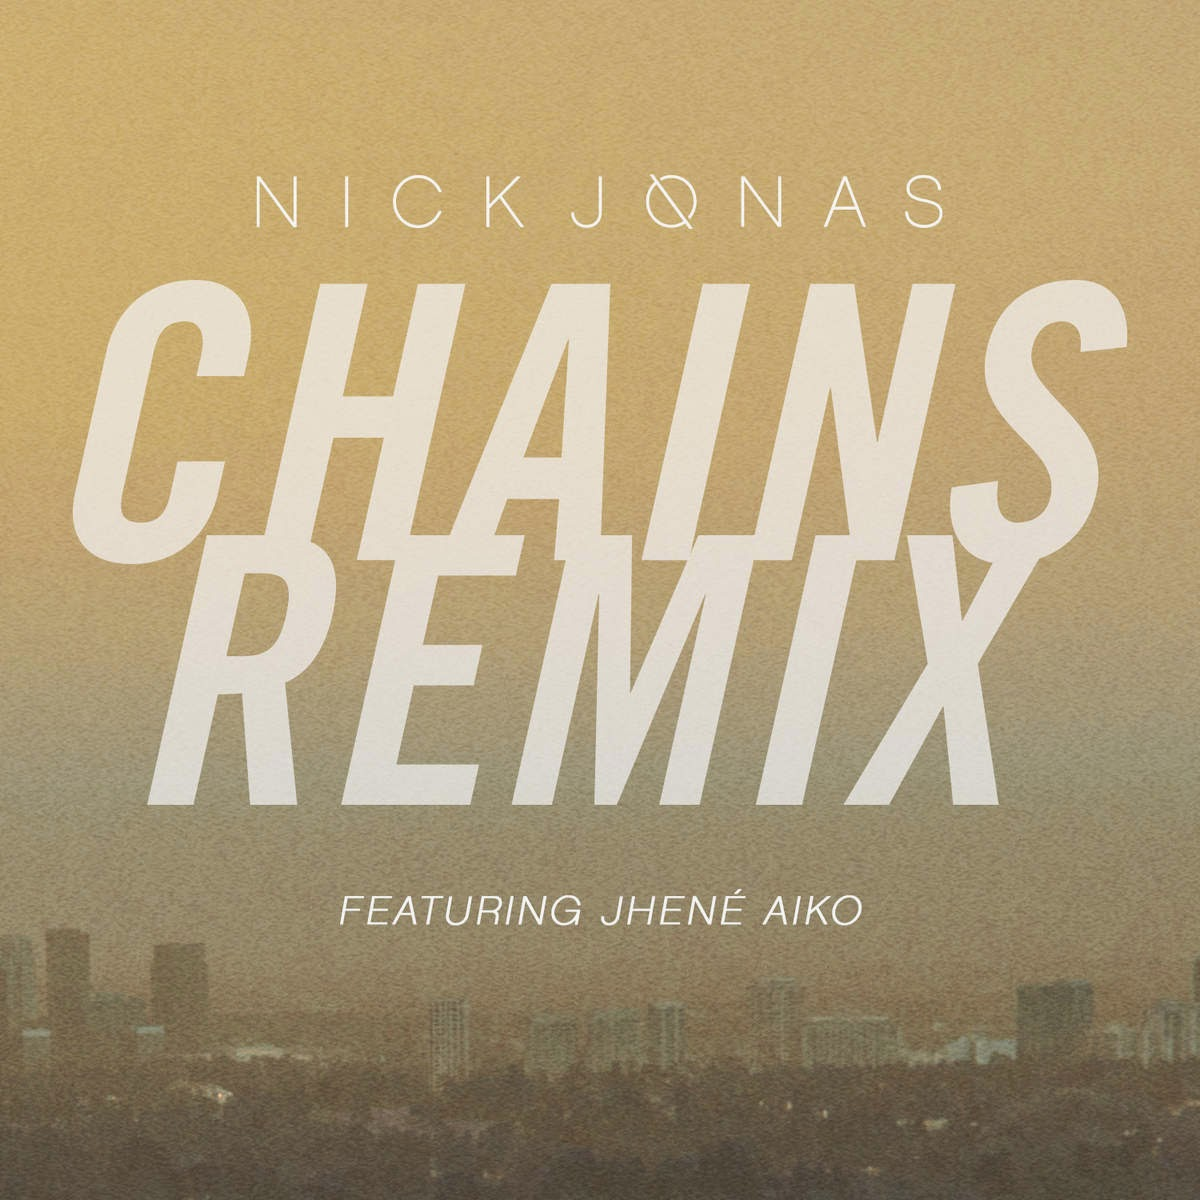 Nick Jonas - Chains (Remix) [feat. Jhené Aiko] - Single Cover